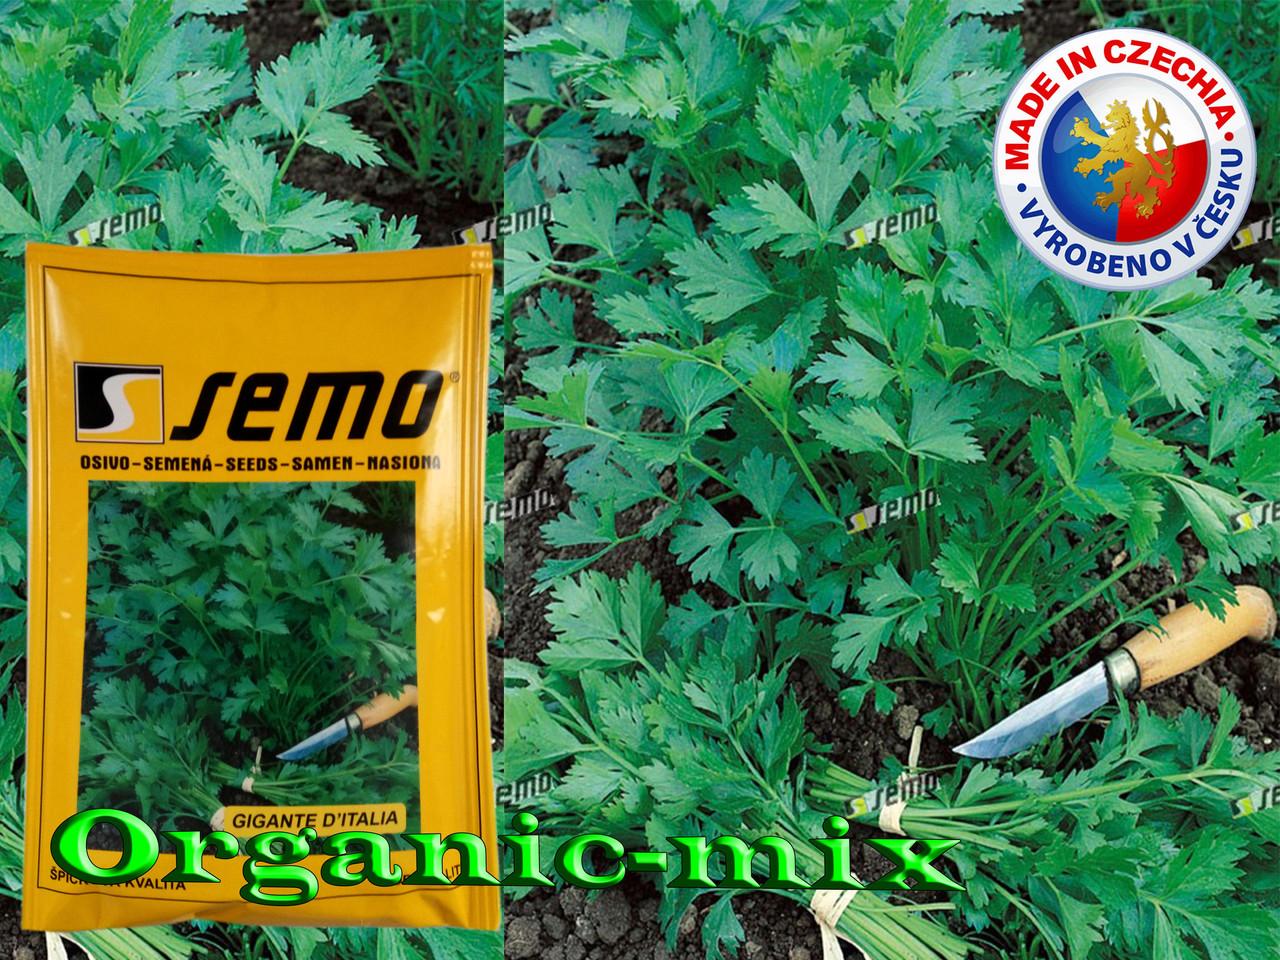 Петрушка Гиганте Италия, проф.пакет 50 грамм, ТМ Semo (Чехия)